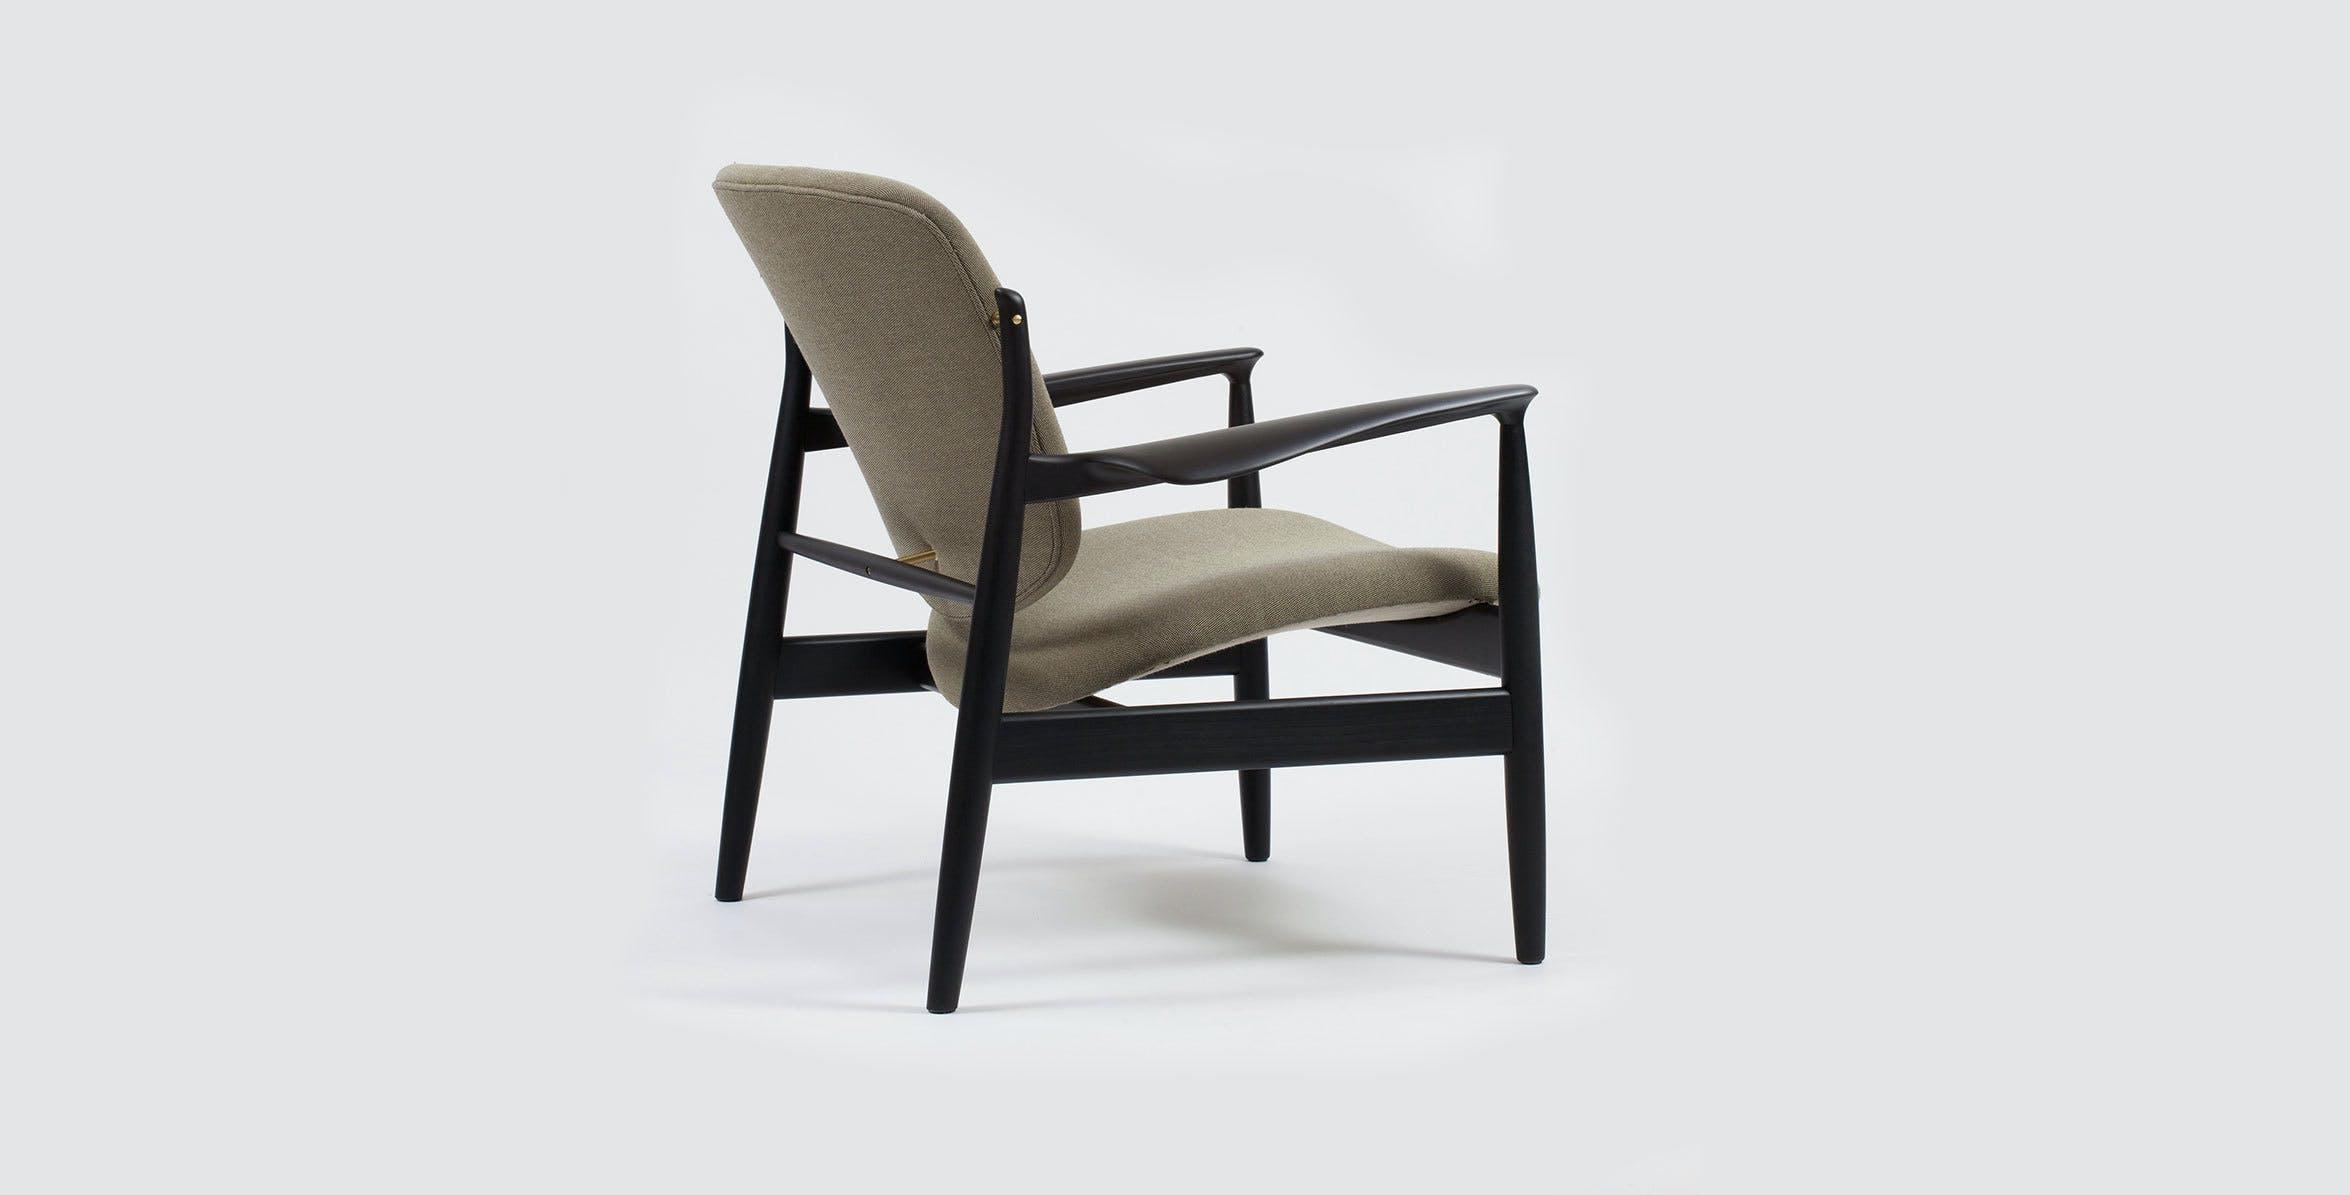 Designer finn juhl